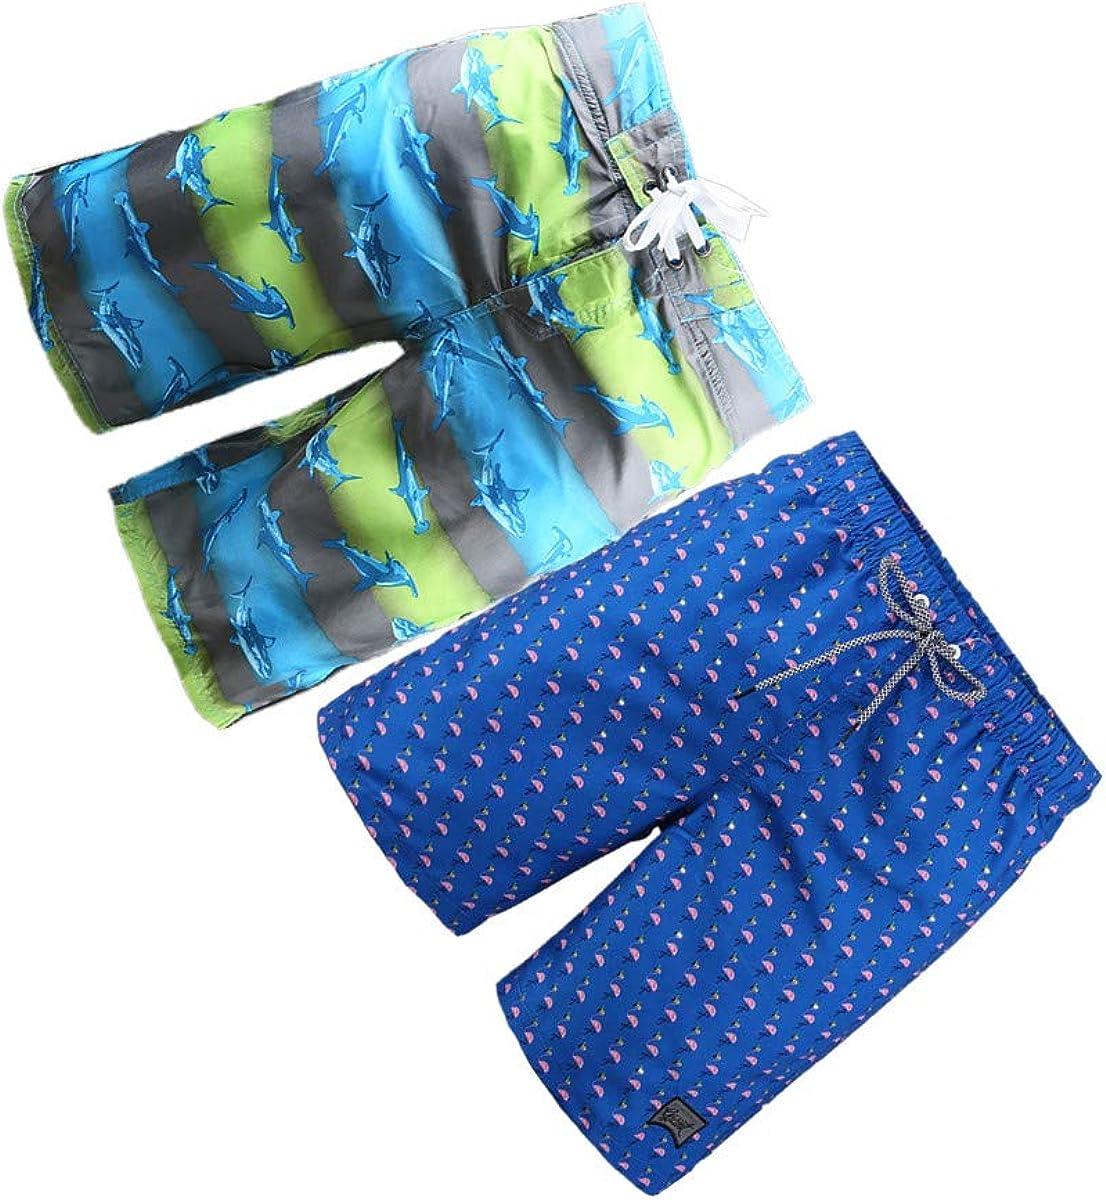 BG 2-Pcs Pack Men's Design Rash Guard Bikini European Style Underwear Pocket Swim Suit